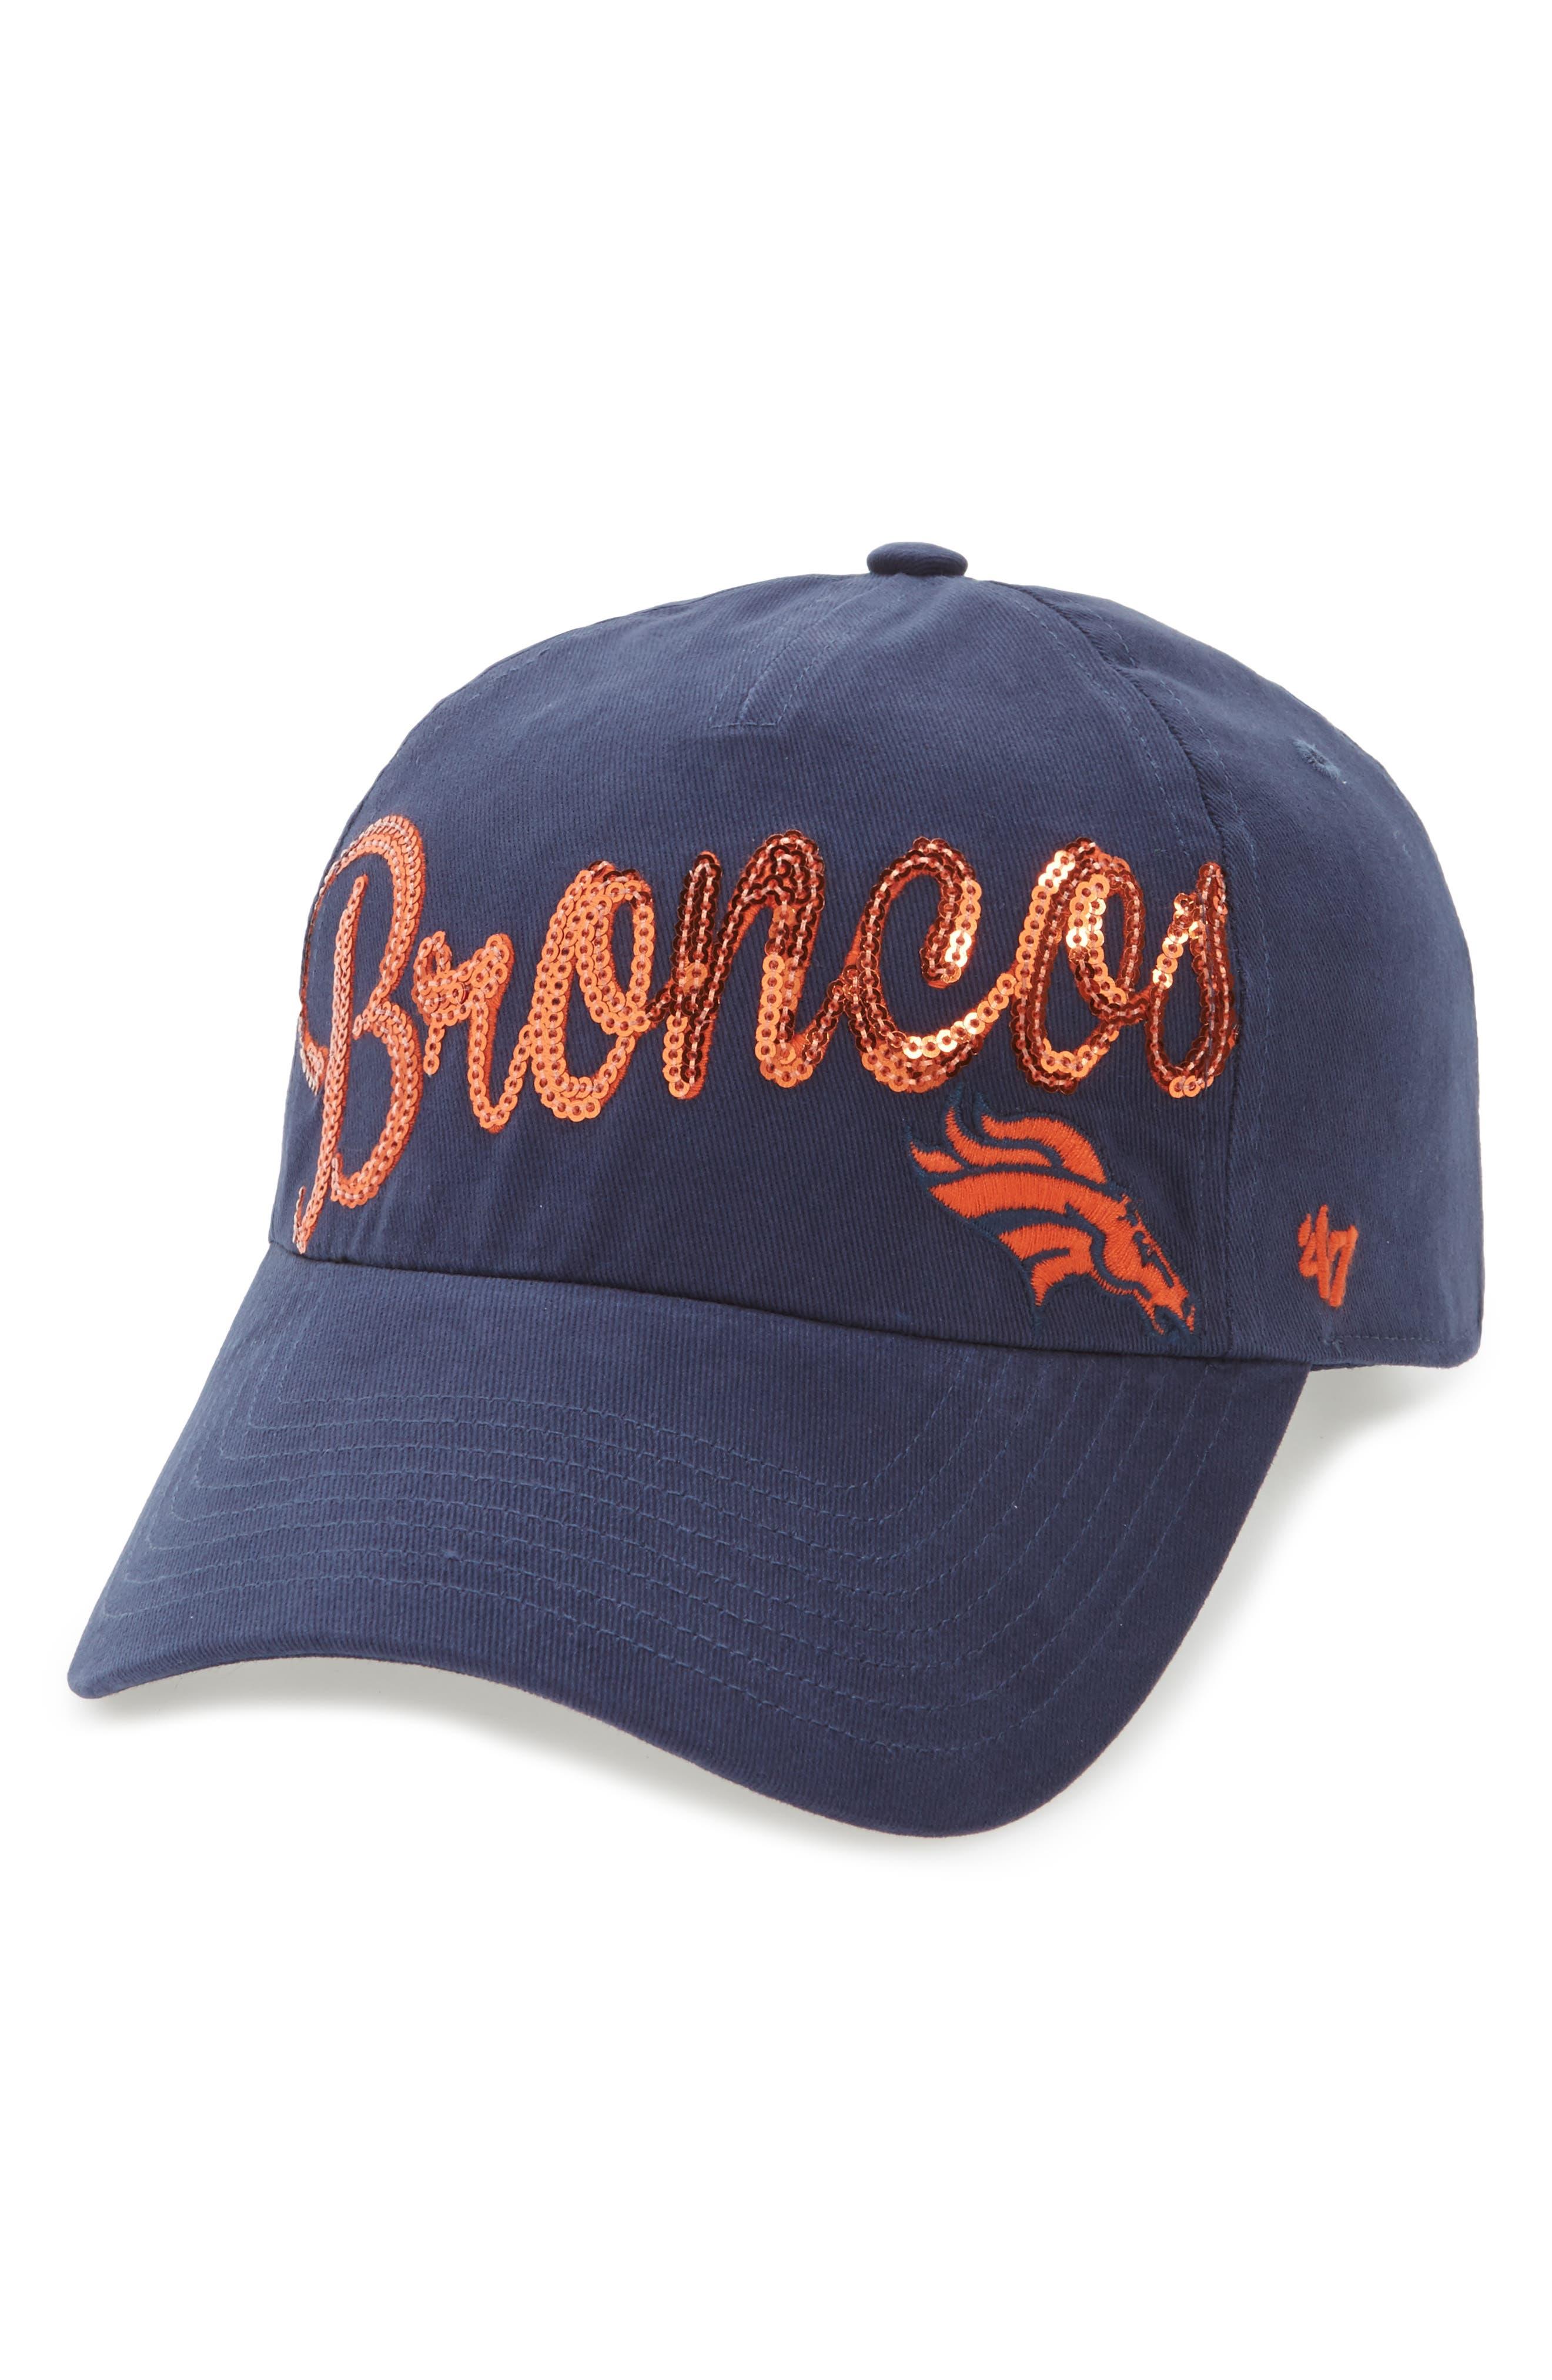 Main Image - '47 Denver Broncos Sparkle Cap